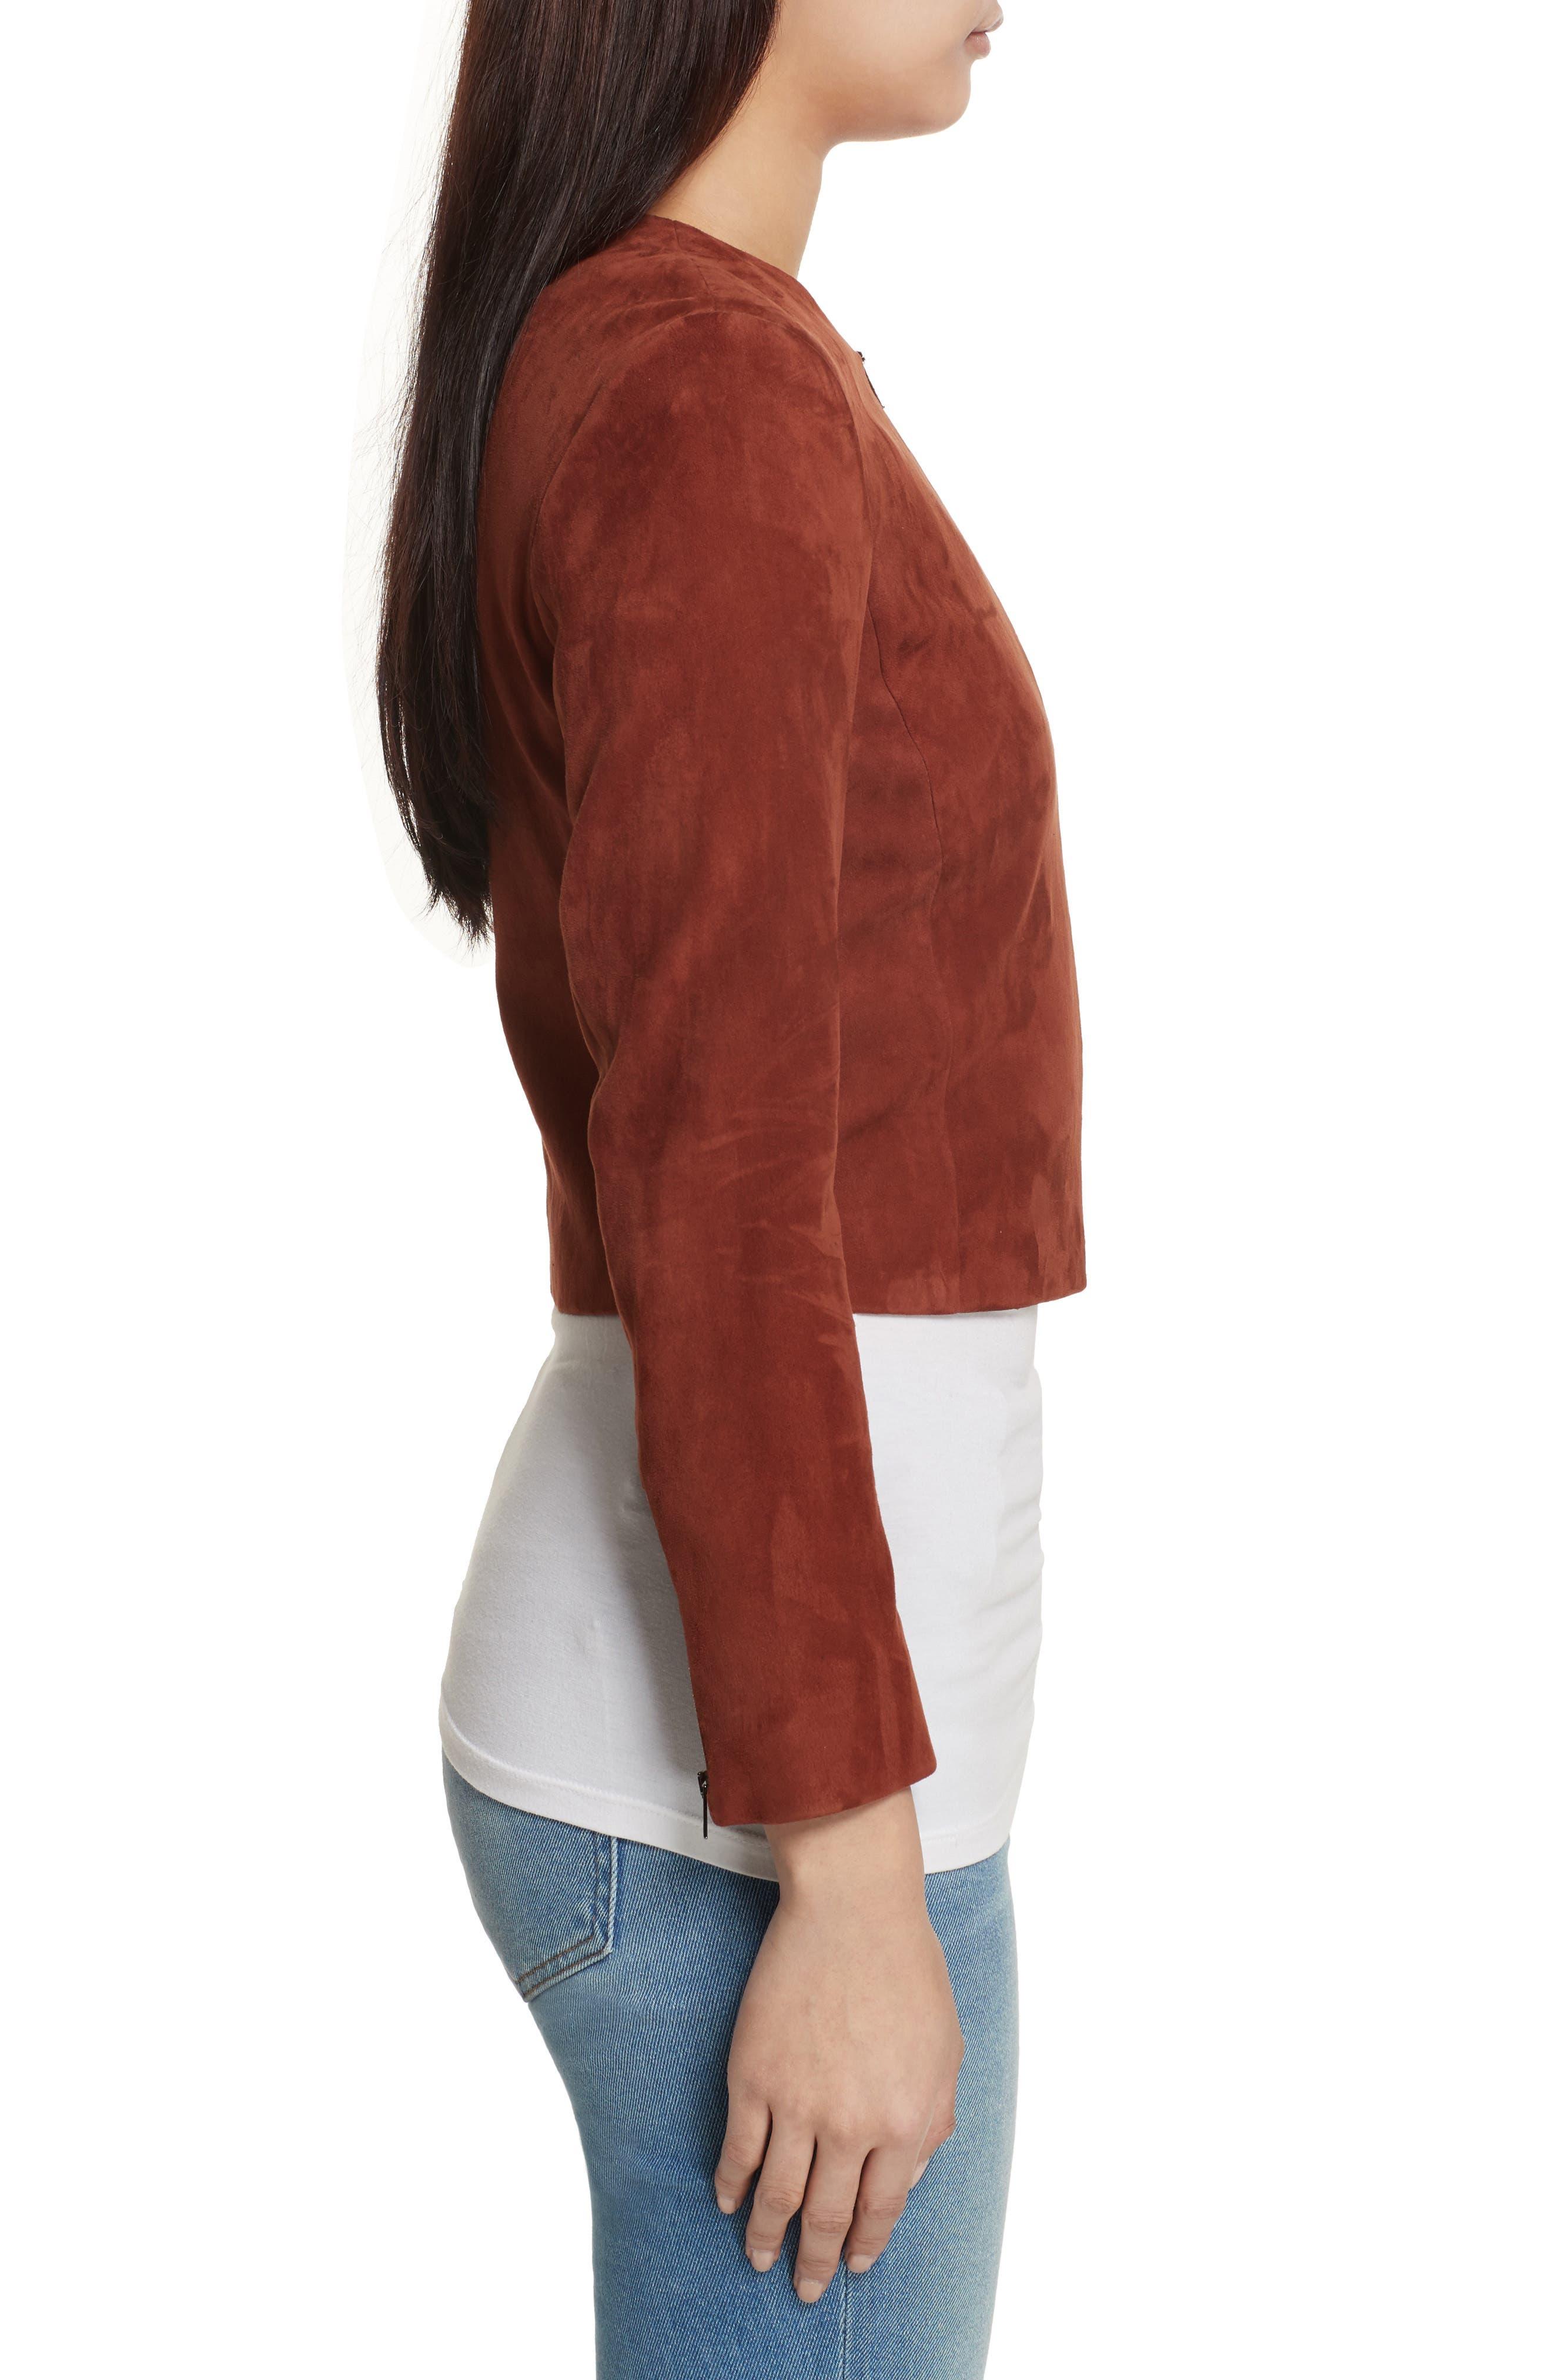 Morene Stretch Suede Jacket,                             Alternate thumbnail 3, color,                             Brown Russet